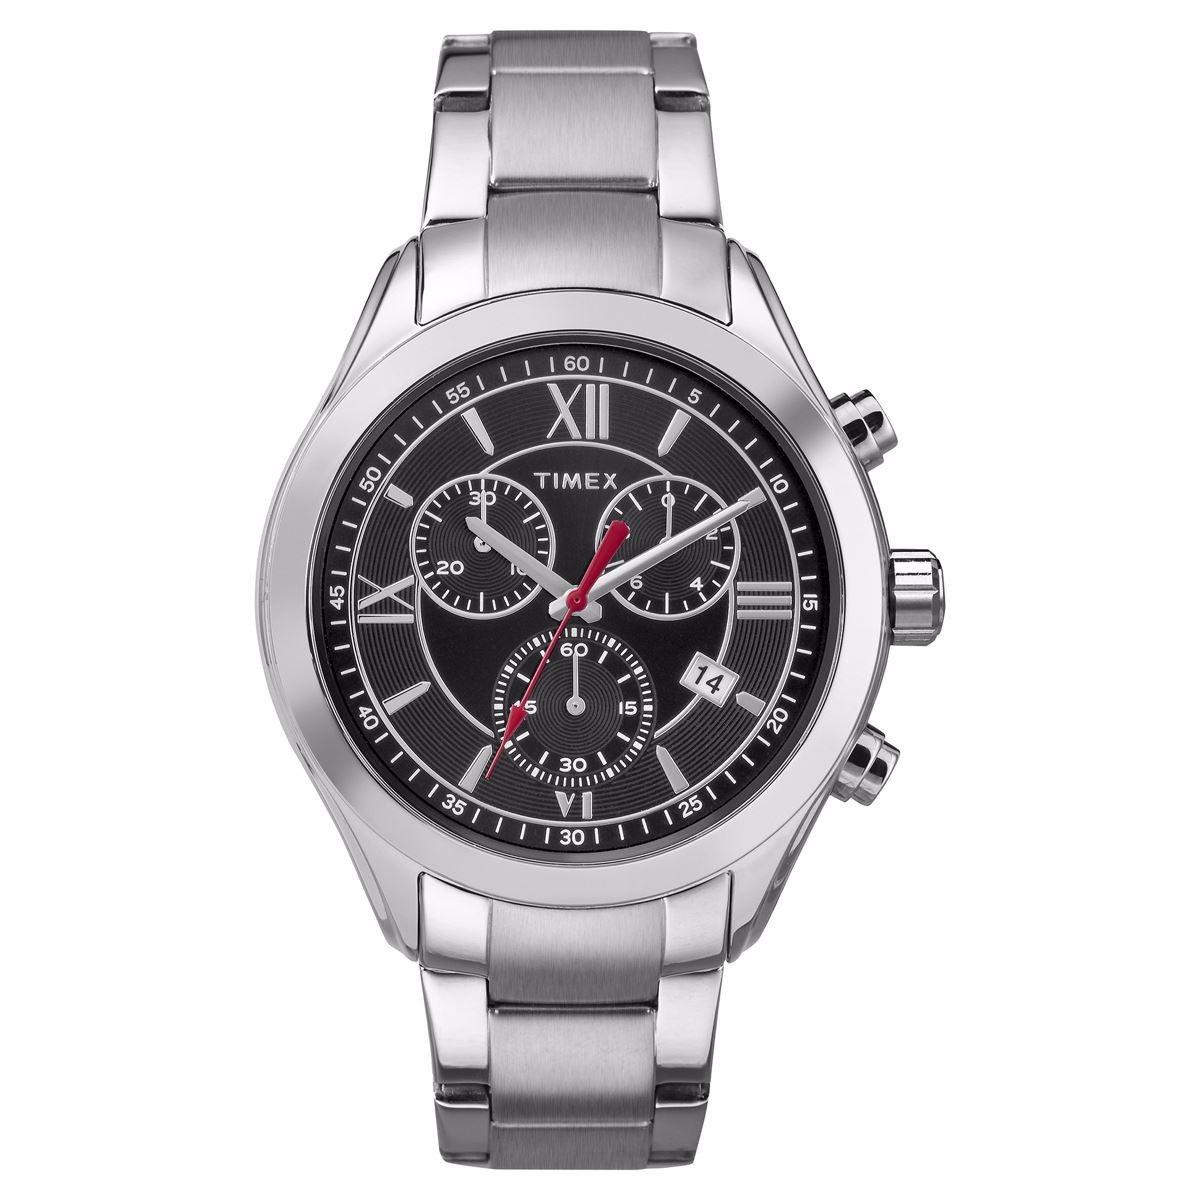 baaad49be317 reloj timex tw2p93900 caballero análogo plateado. Cargando zoom.